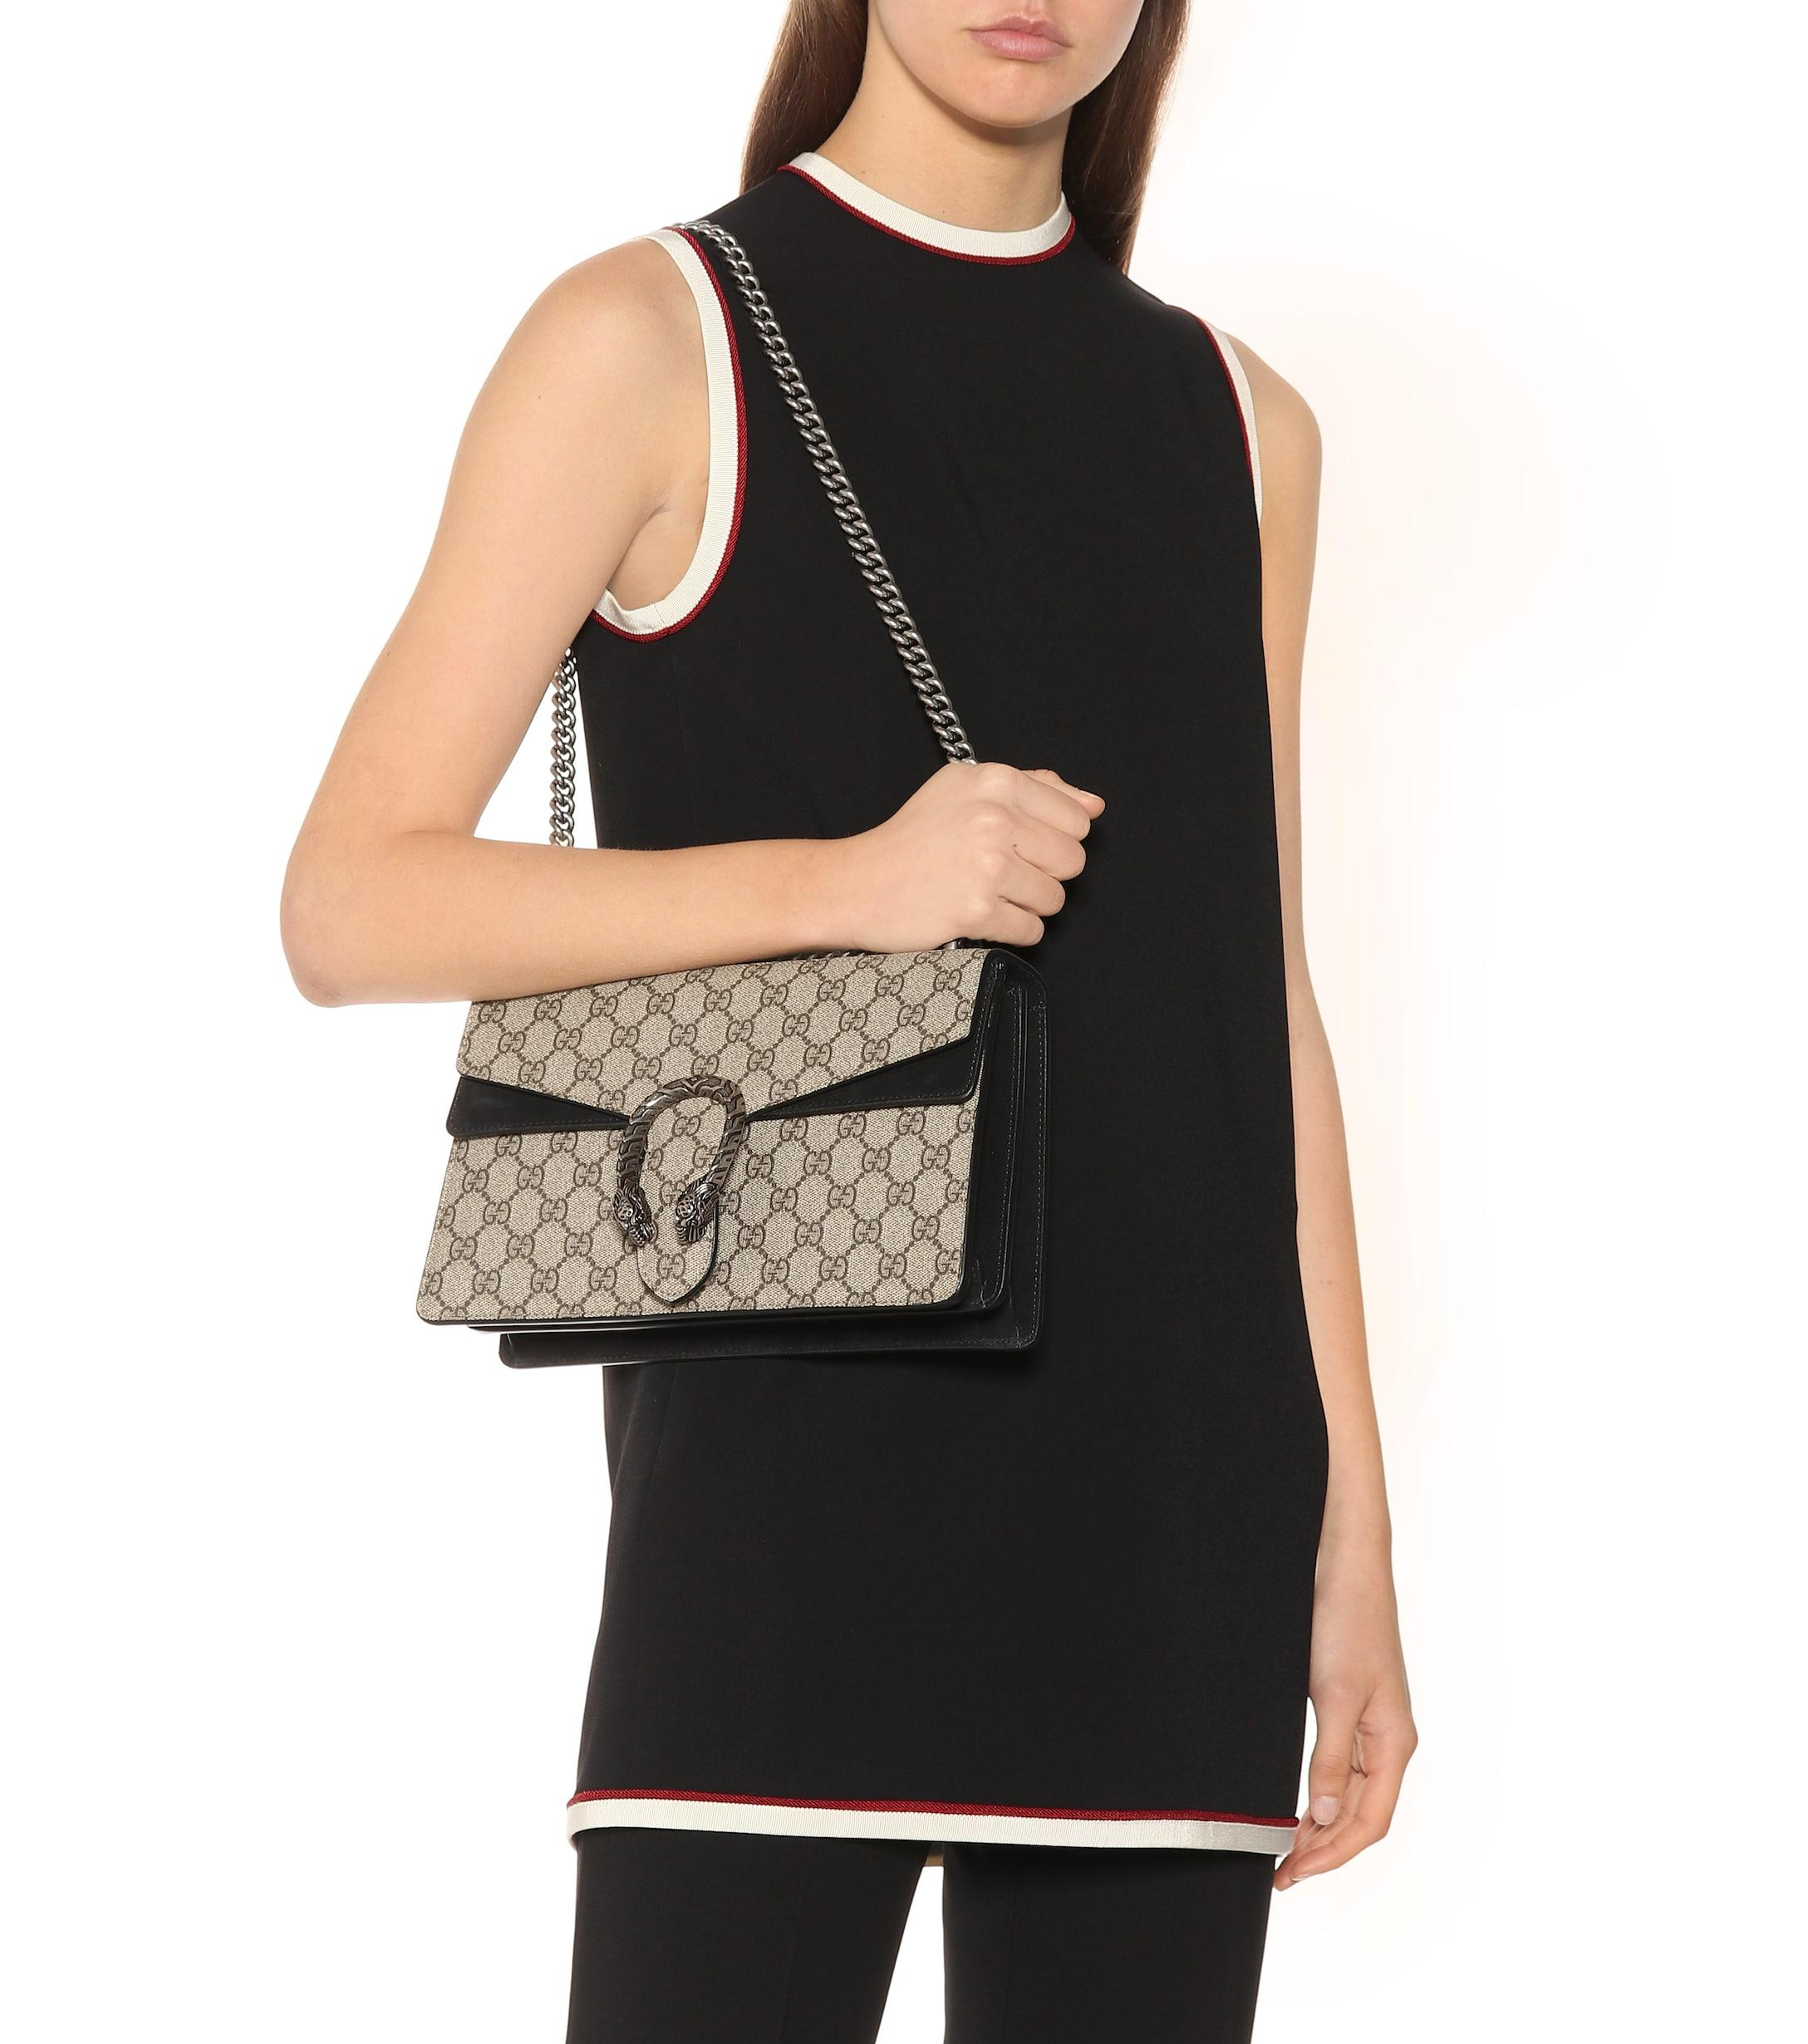 34e48acaa4918 Gucci - Natural Dionysus GG Supreme Small Shoulder Bag - Lyst. View  fullscreen